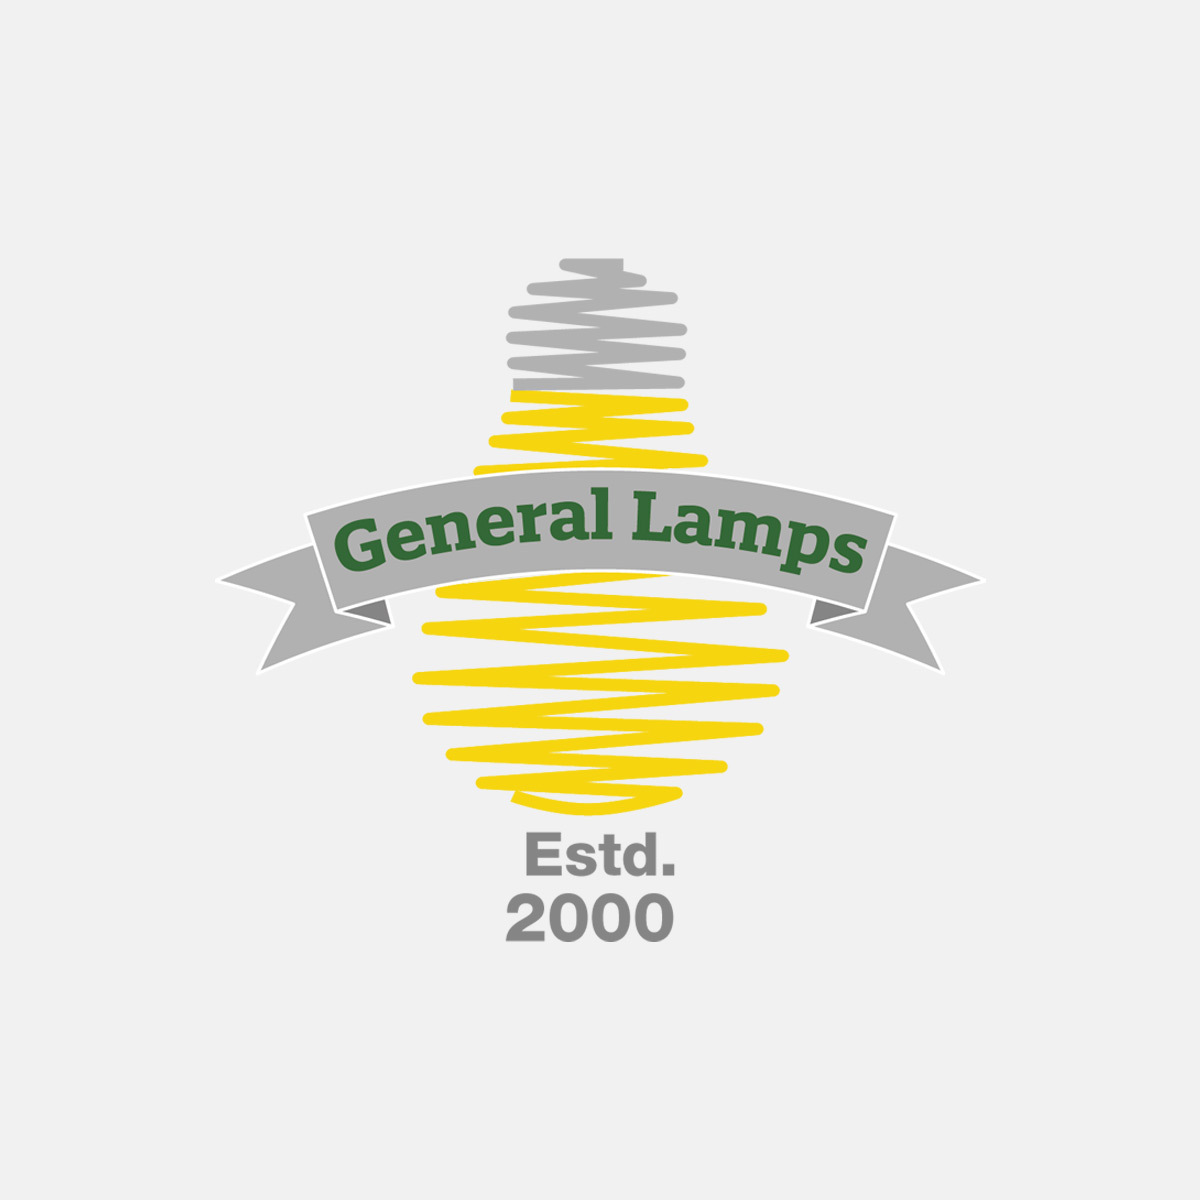 Theatre Lamp T26 T27 GCS 240V 650W GY9.5